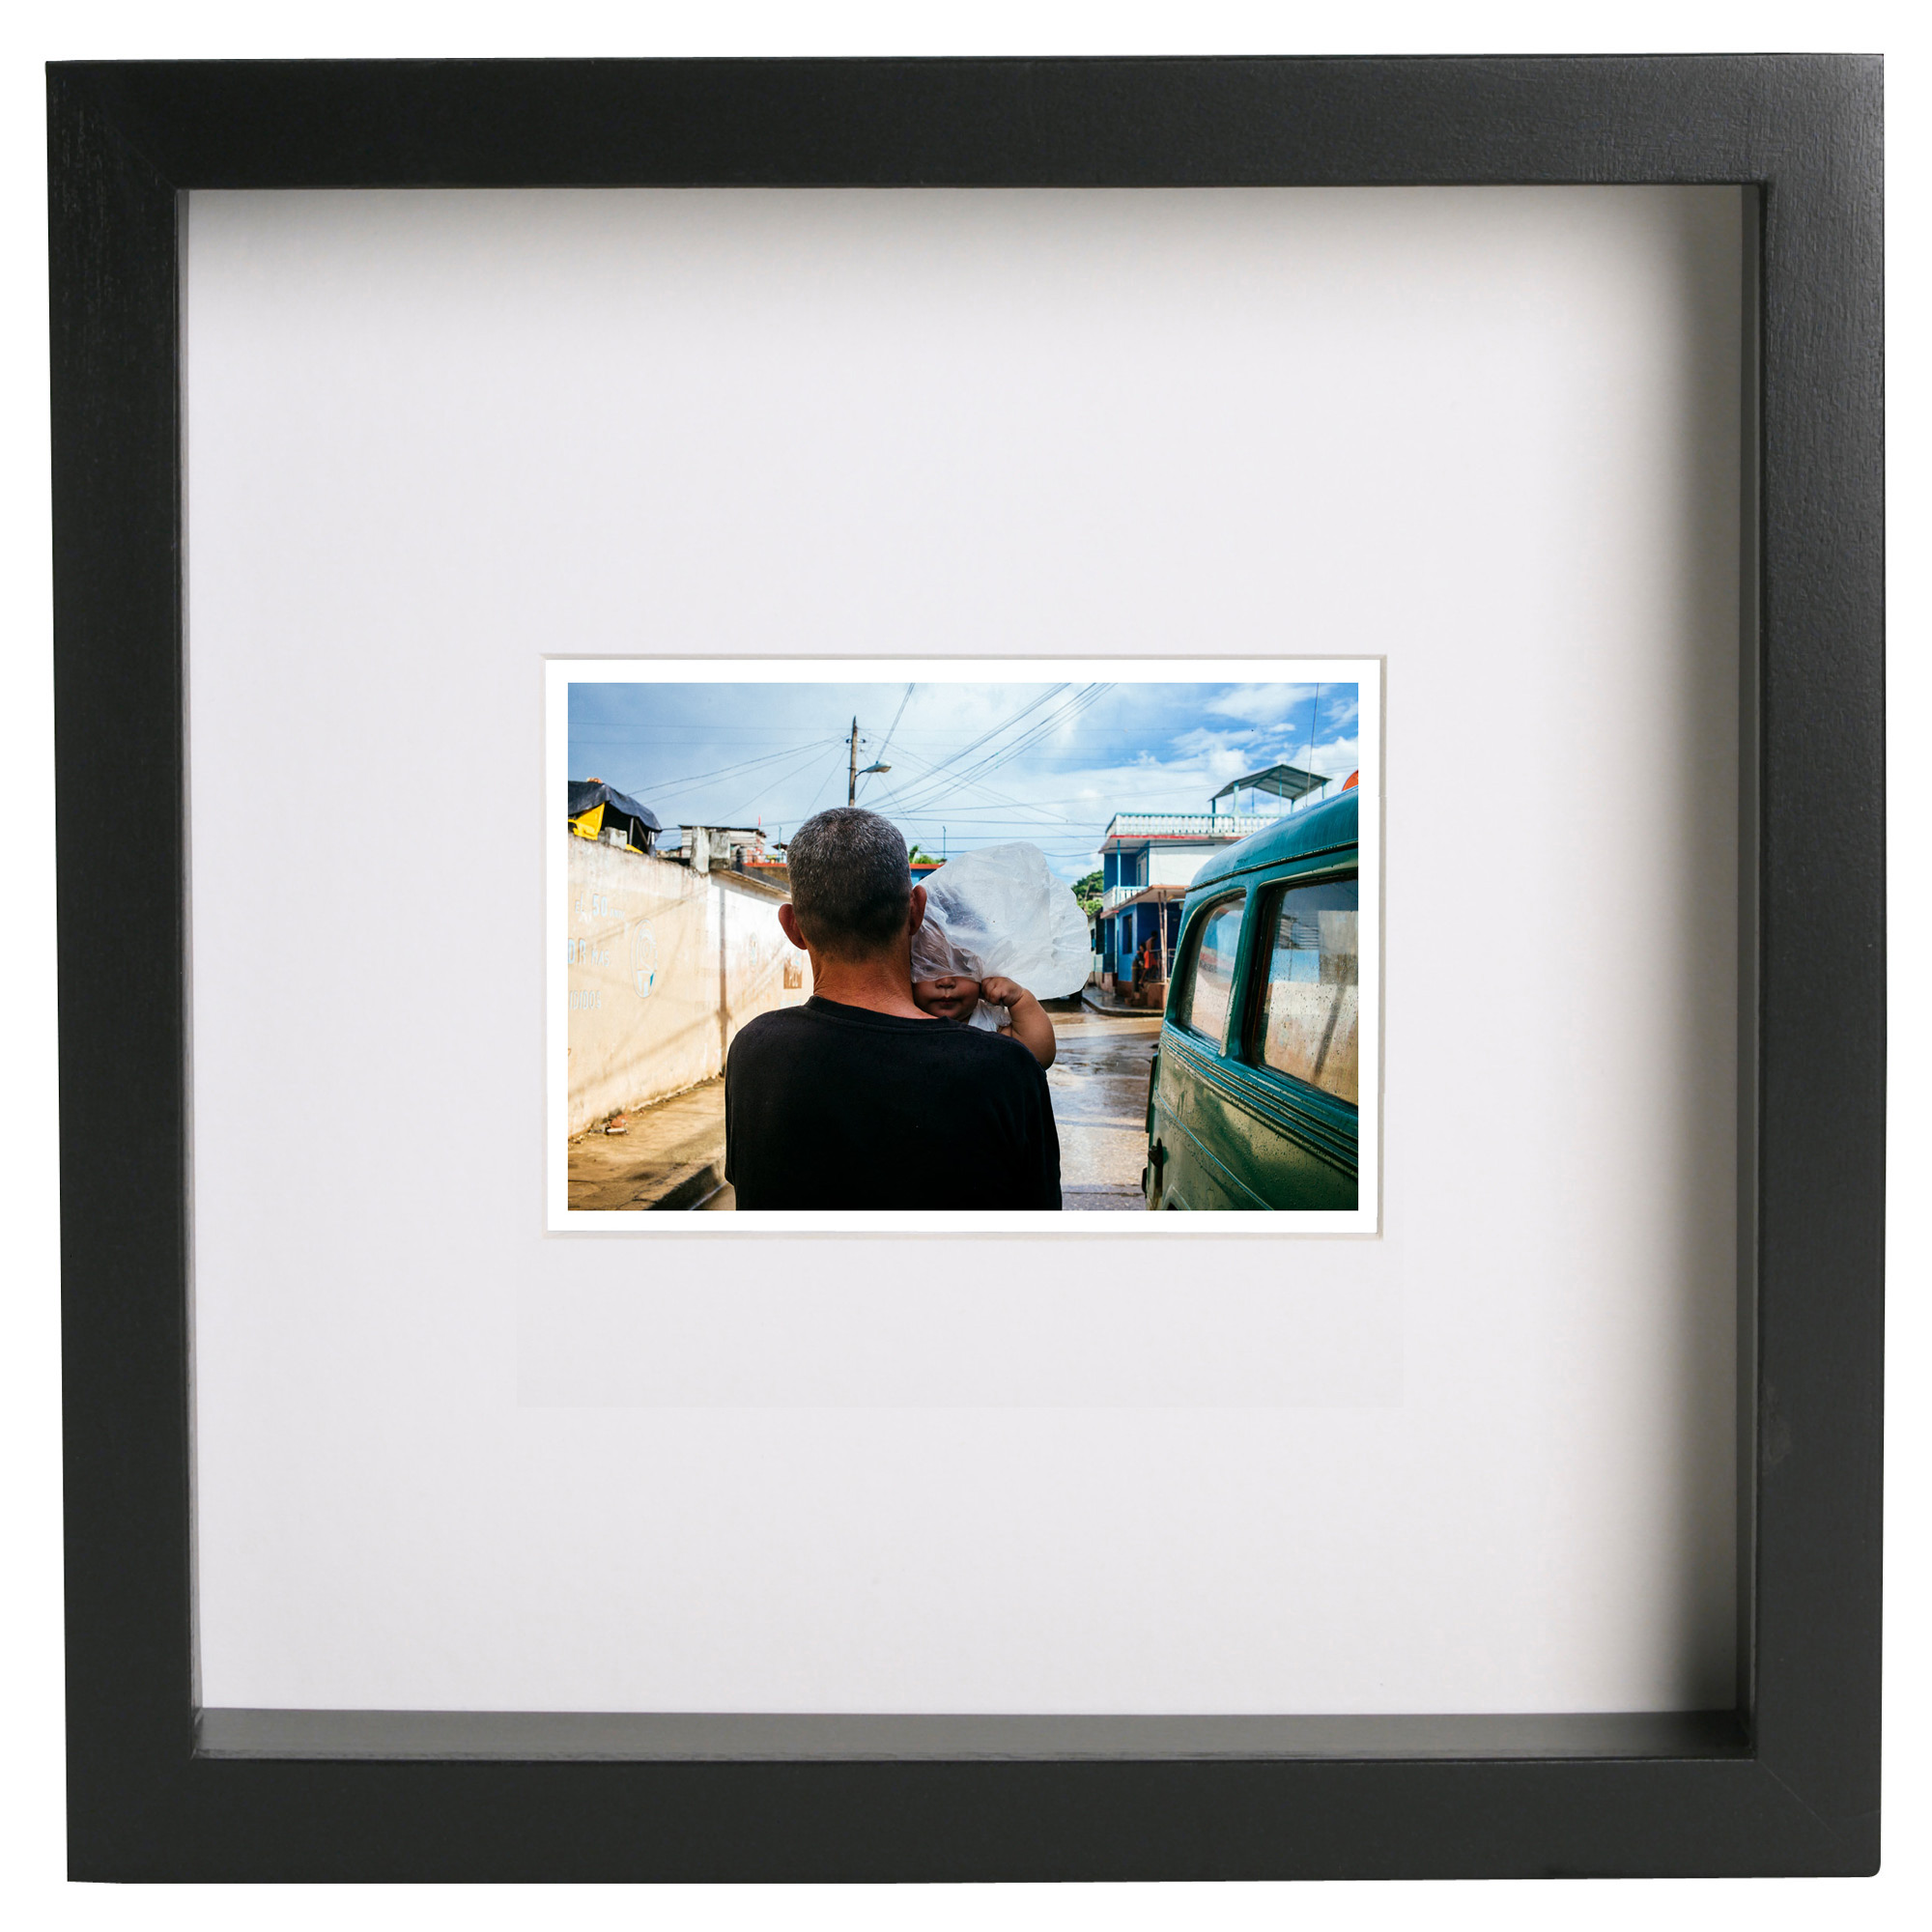 cuba-fine-art-collection-one-framed-03.jpg